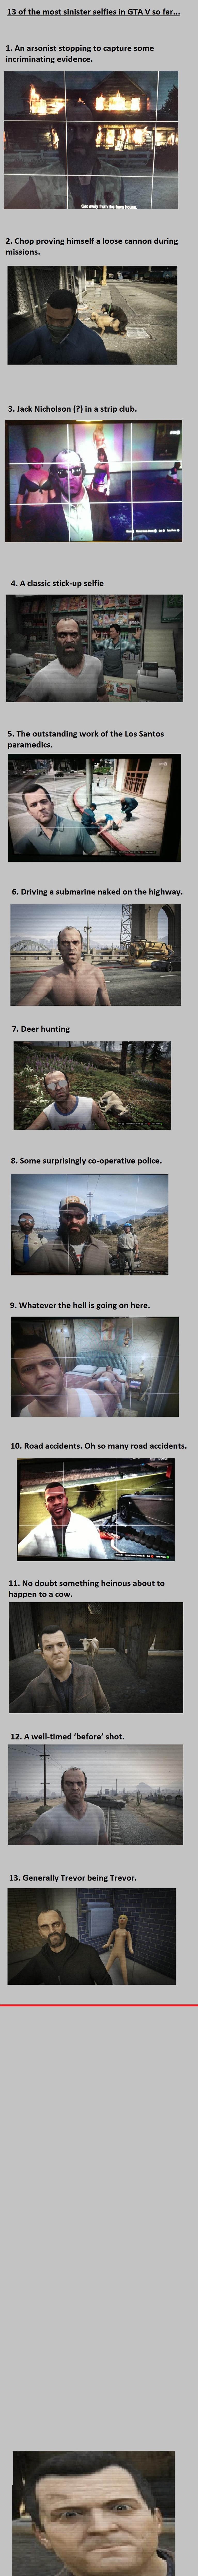 13 sinister GTA selfies. 13 of the most sinister GTA 5 selfies so far....